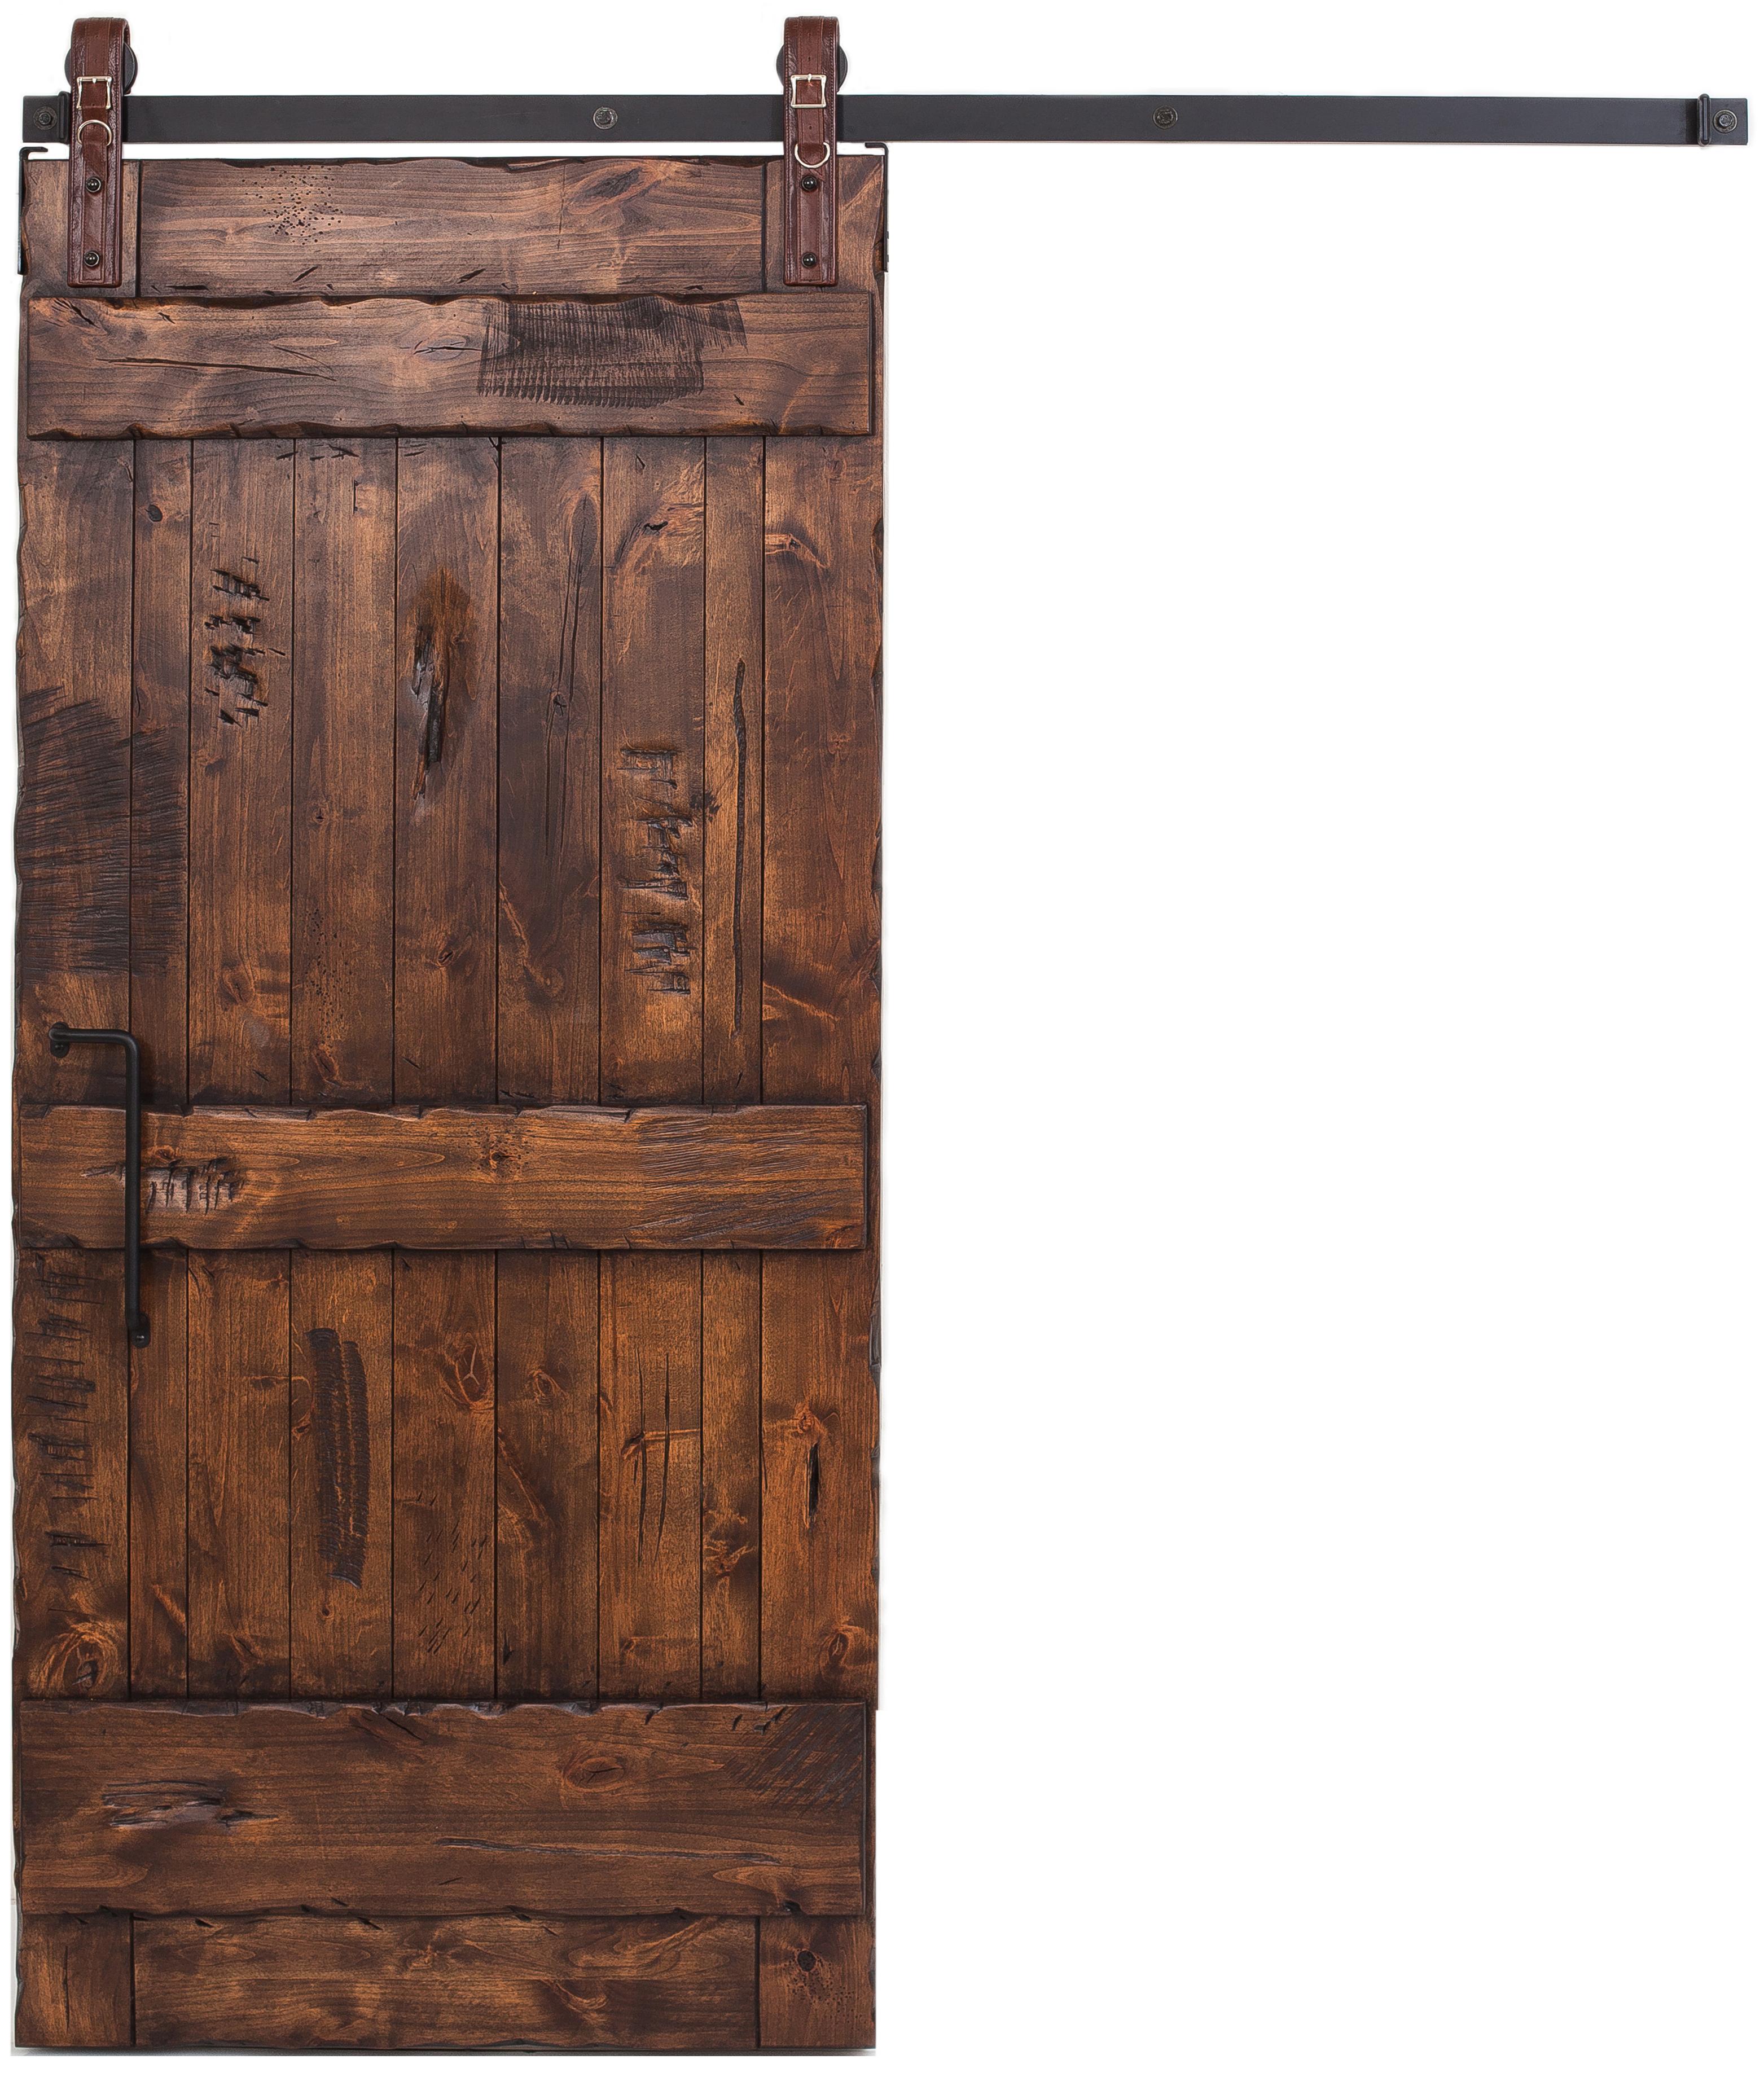 Rustic Ranch Interior Design: Ranch Style Barn Door: Ranch Style Interior Doors